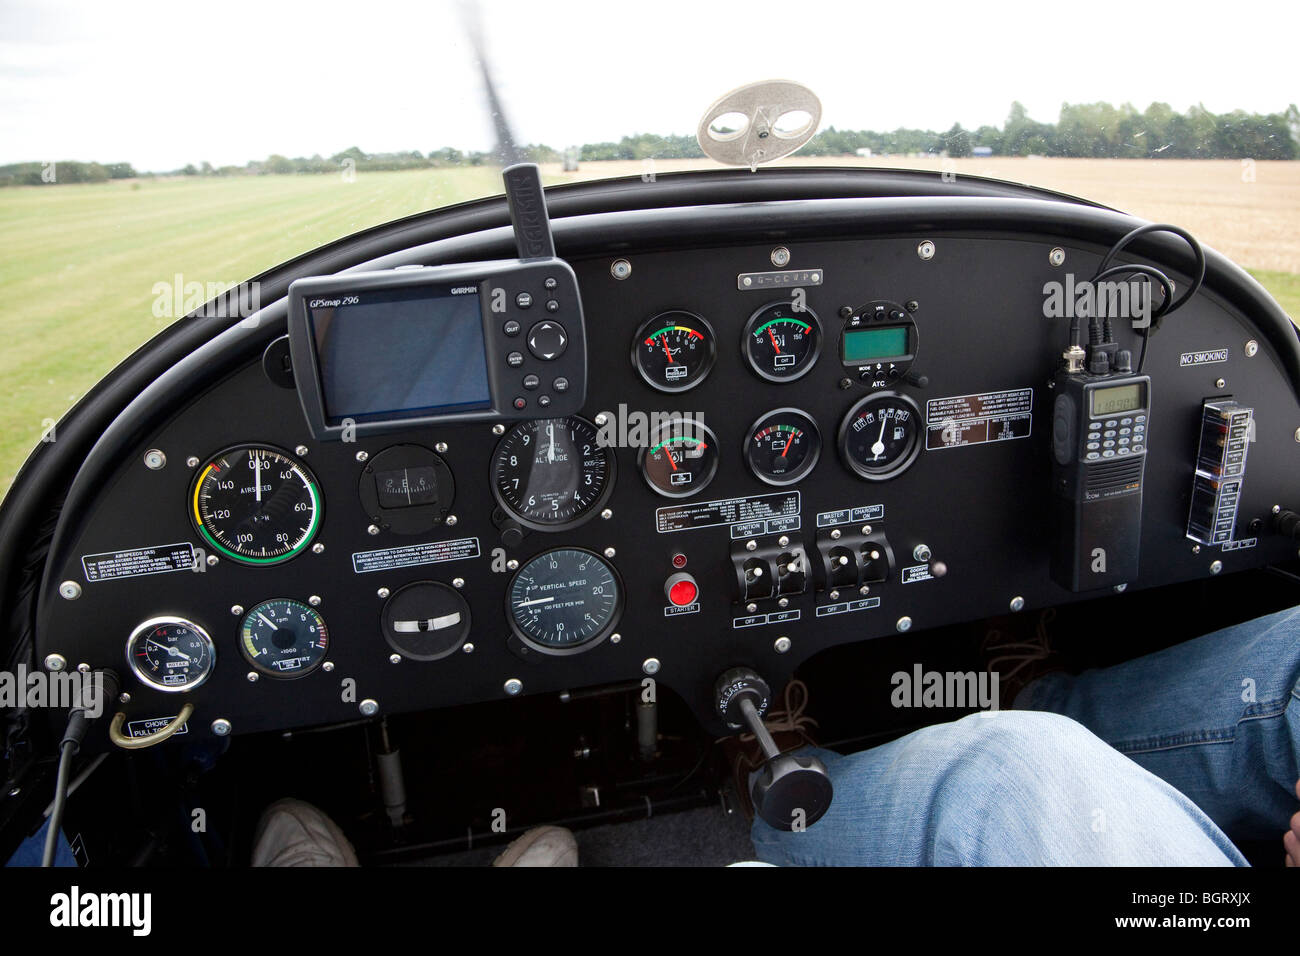 instrument panel inside cockpit of light aircraft EV-97 Evektor EUROSTAR - Stock Image